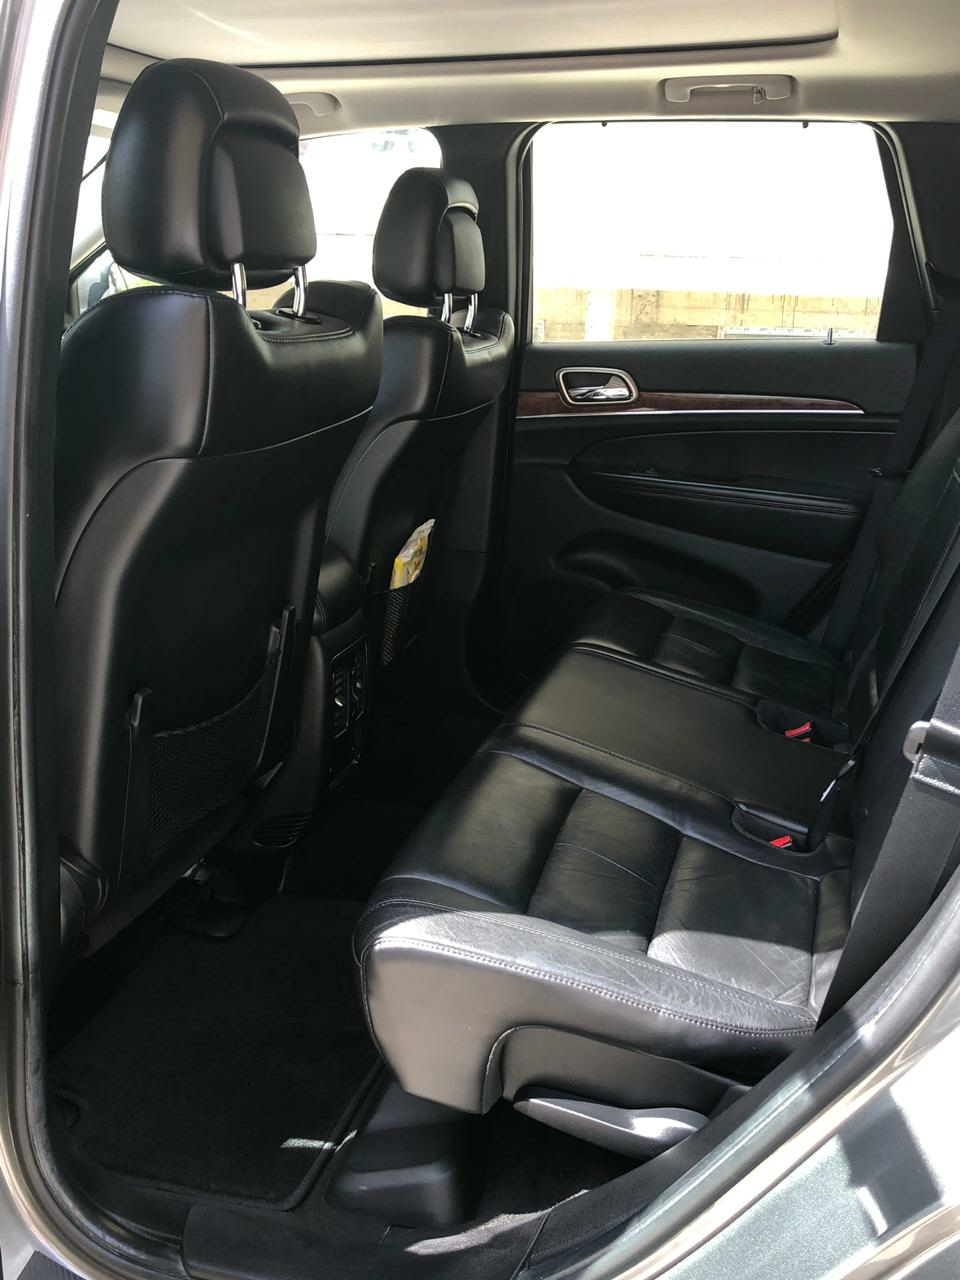 Jeep Grand Cherokee 3..6(lt) 2012 Подержанный  $23700